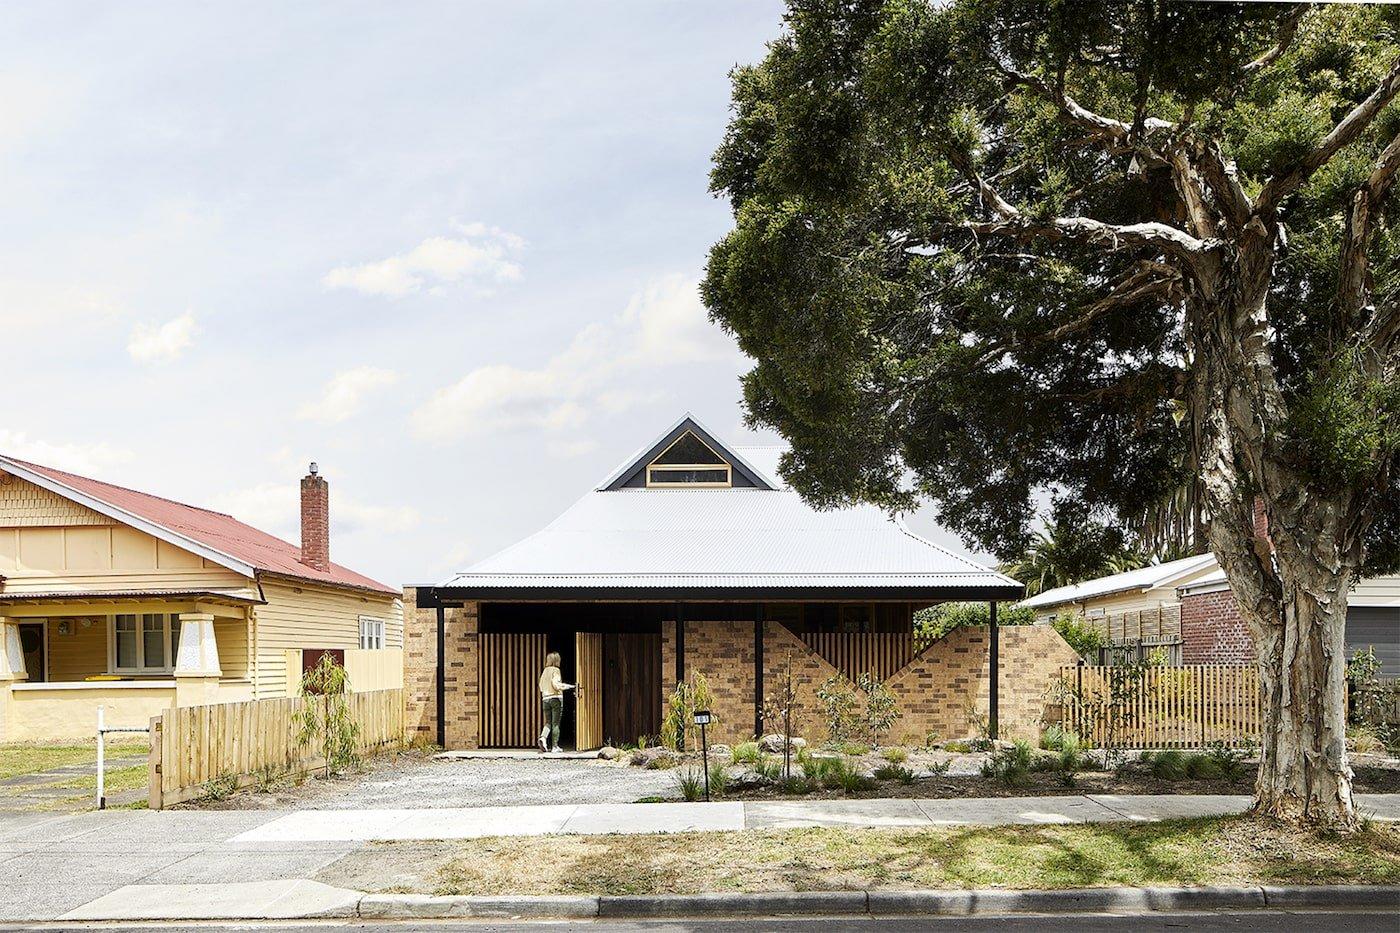 Eco Edition_MRTN Architects_Good Life House_Architecture interiors 5-min